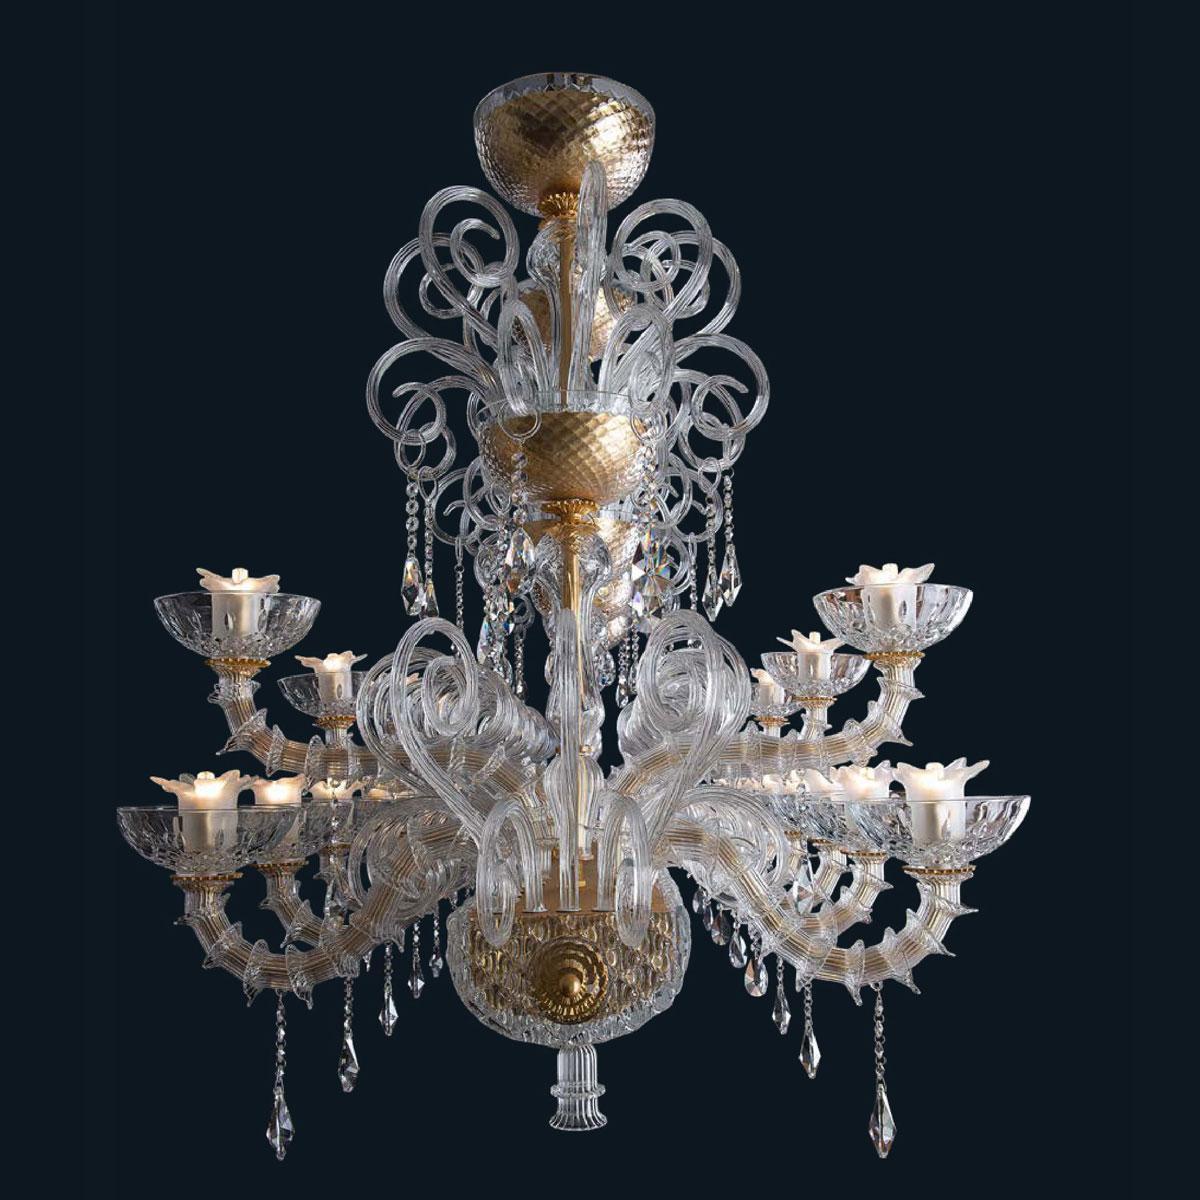 """Cedric"" Murano glas Kronleuchter - 16+8 flammig - transparent"